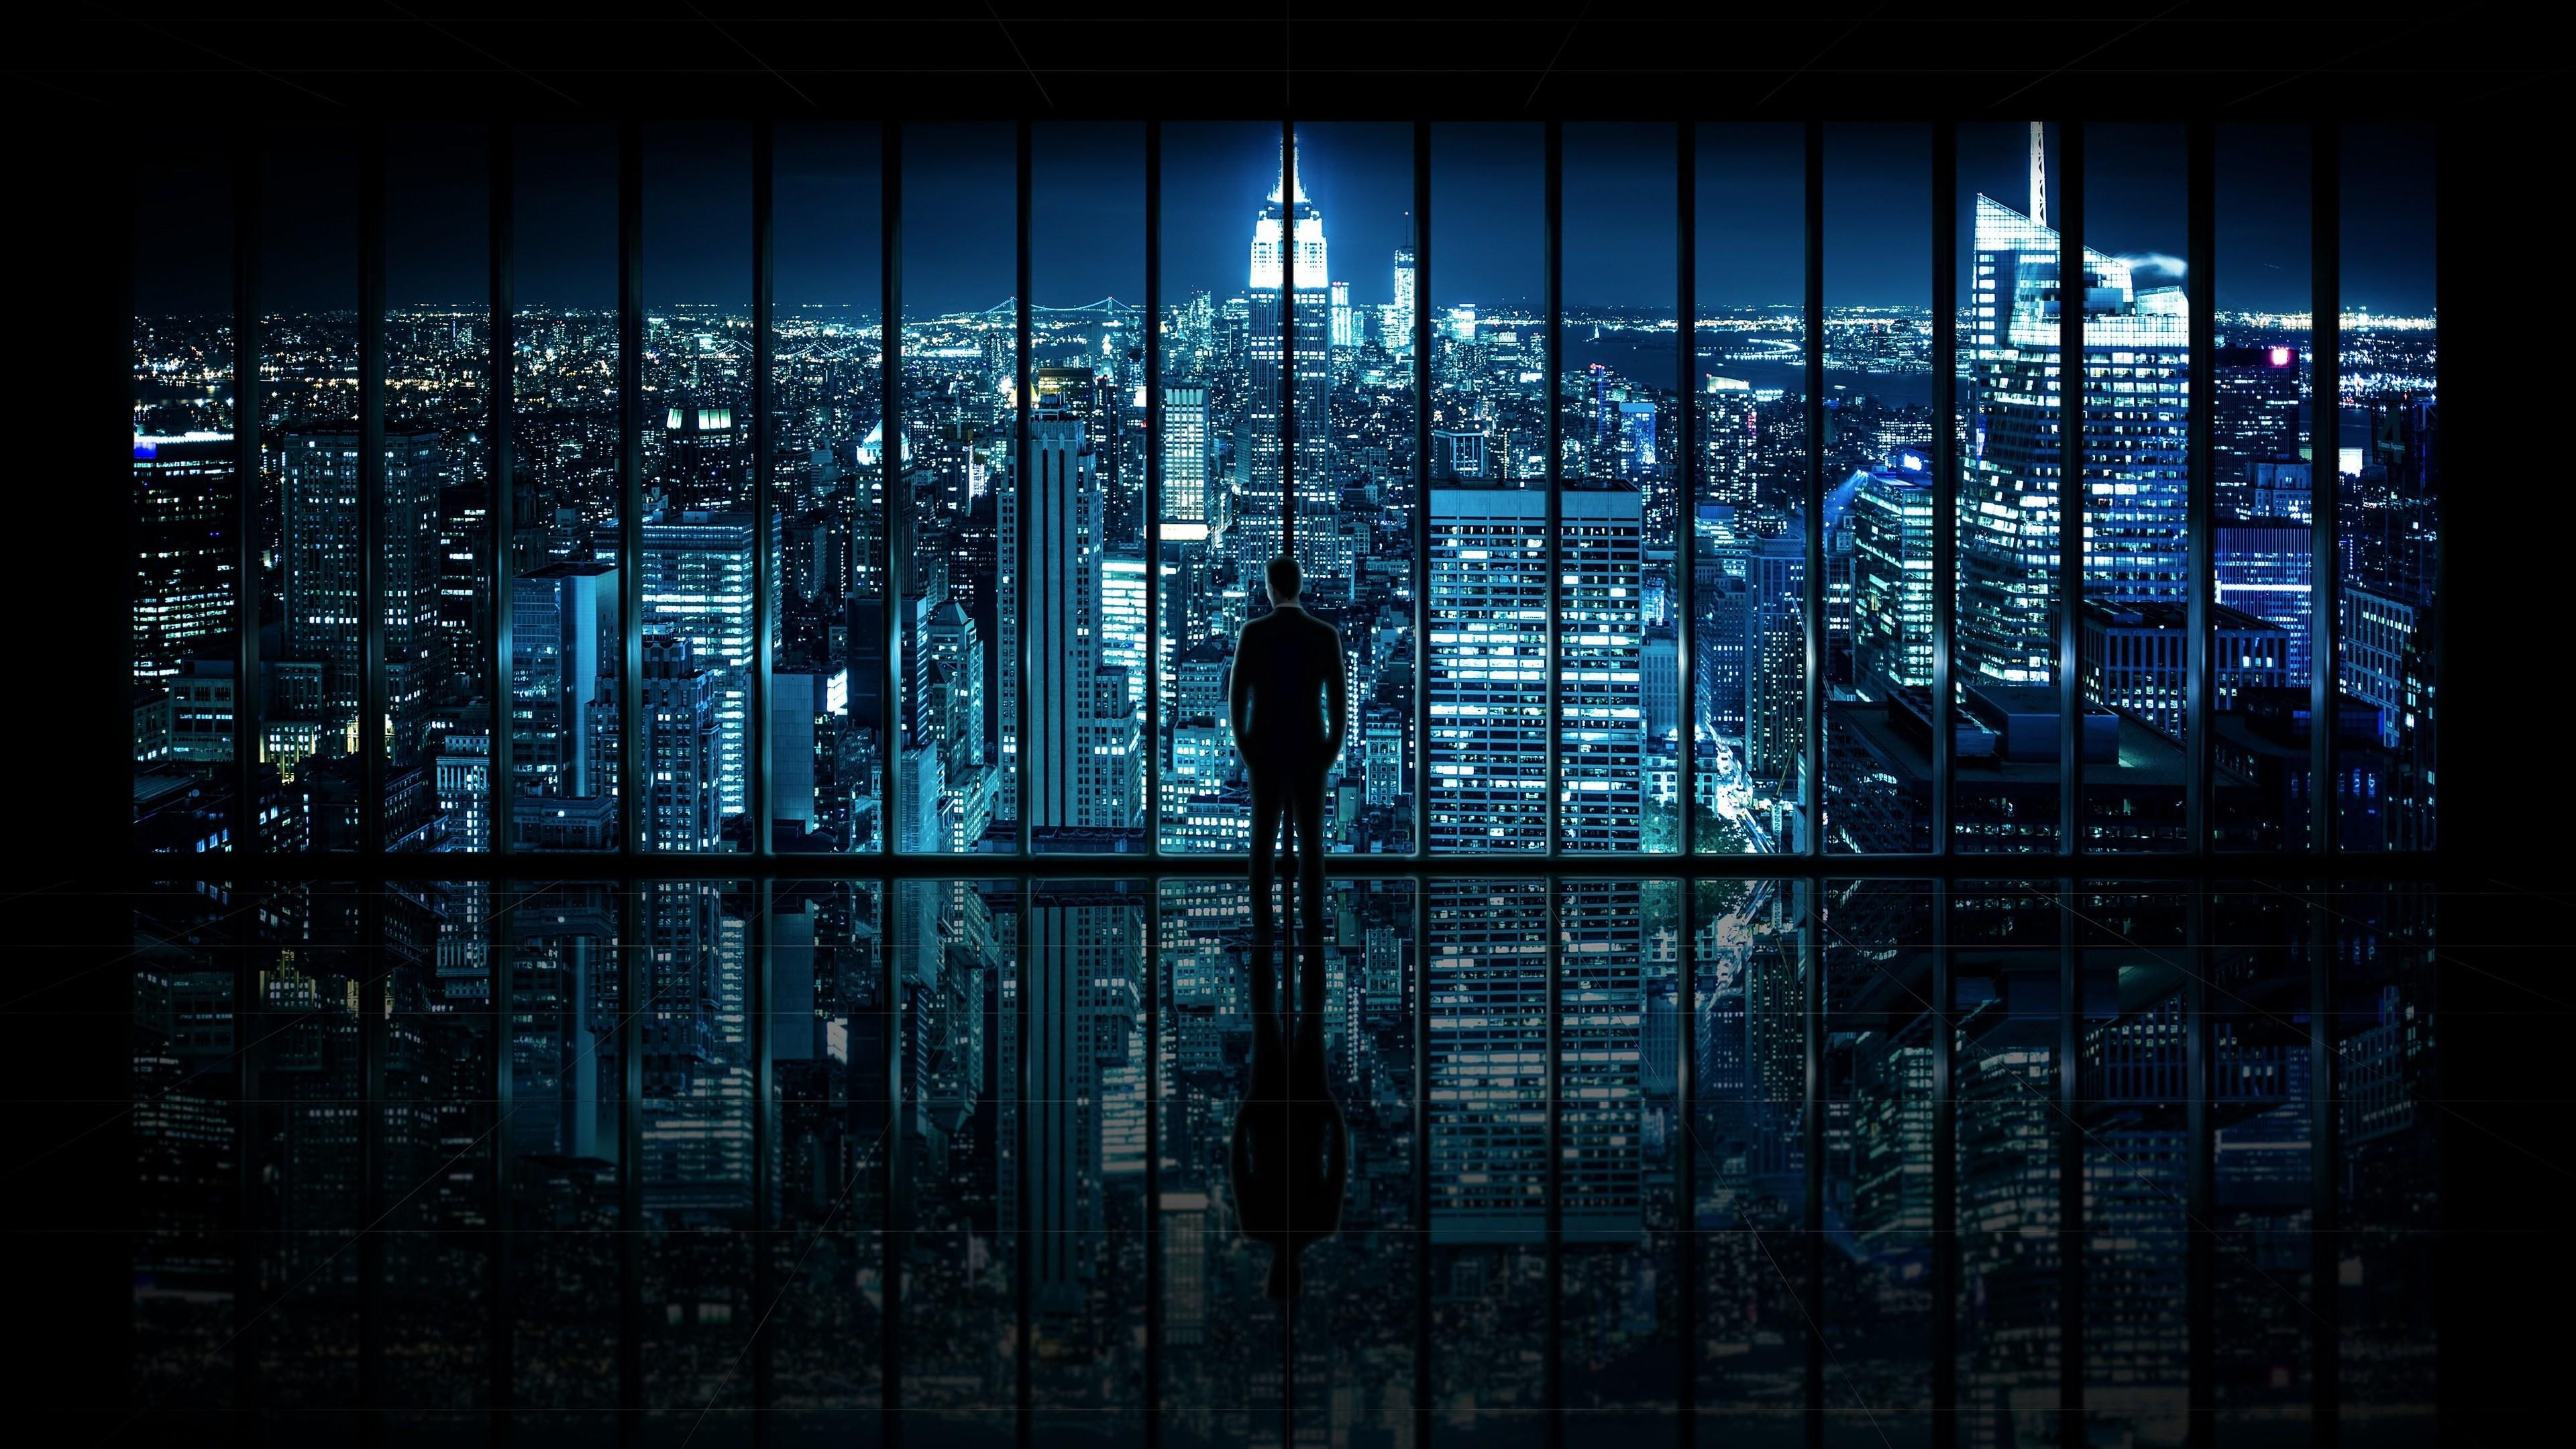 Gotham City Gotham Night Window Cityscape City Lights Metropolis Man Darkness Panorama View City Wallpaper Wallpaper Windows 10 Dual Monitor Wallpaper